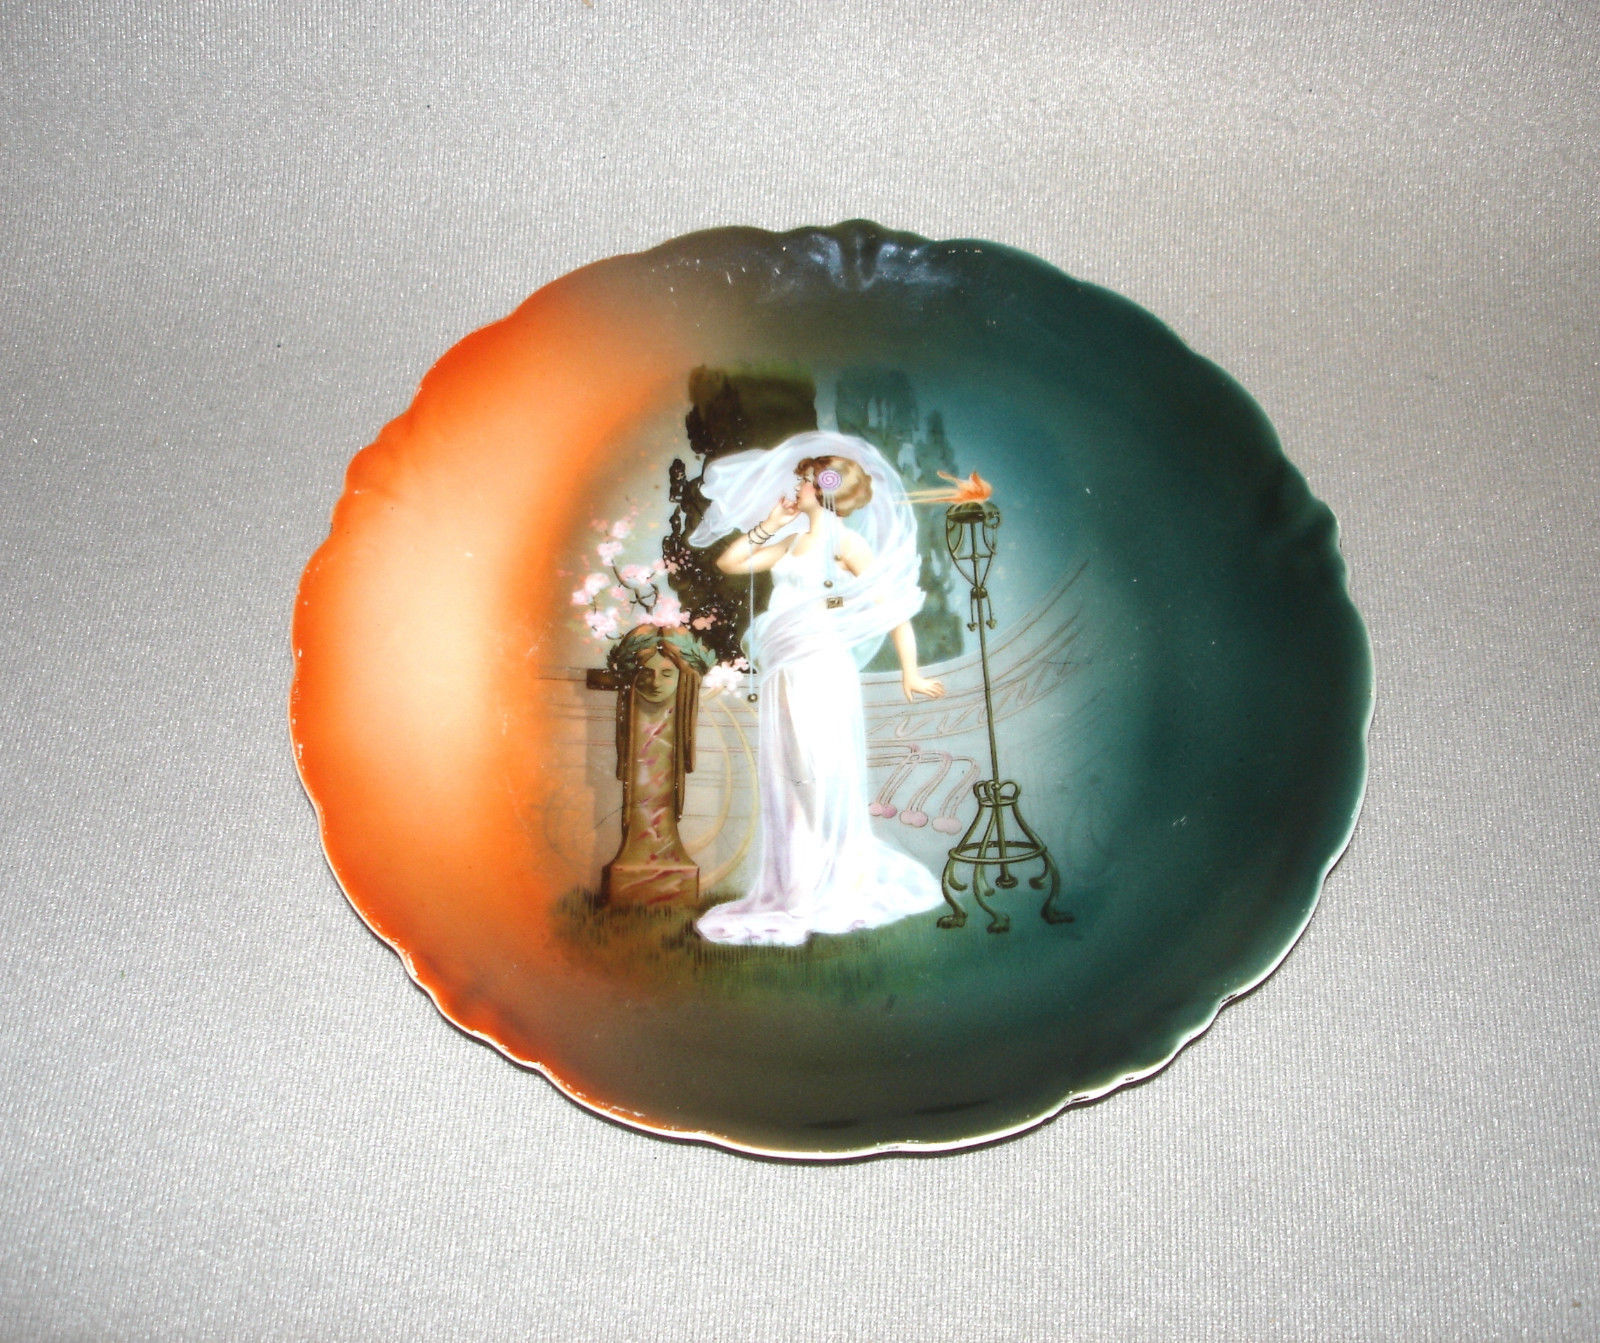 J & C Malmaison Bavaria Porcelain Plate